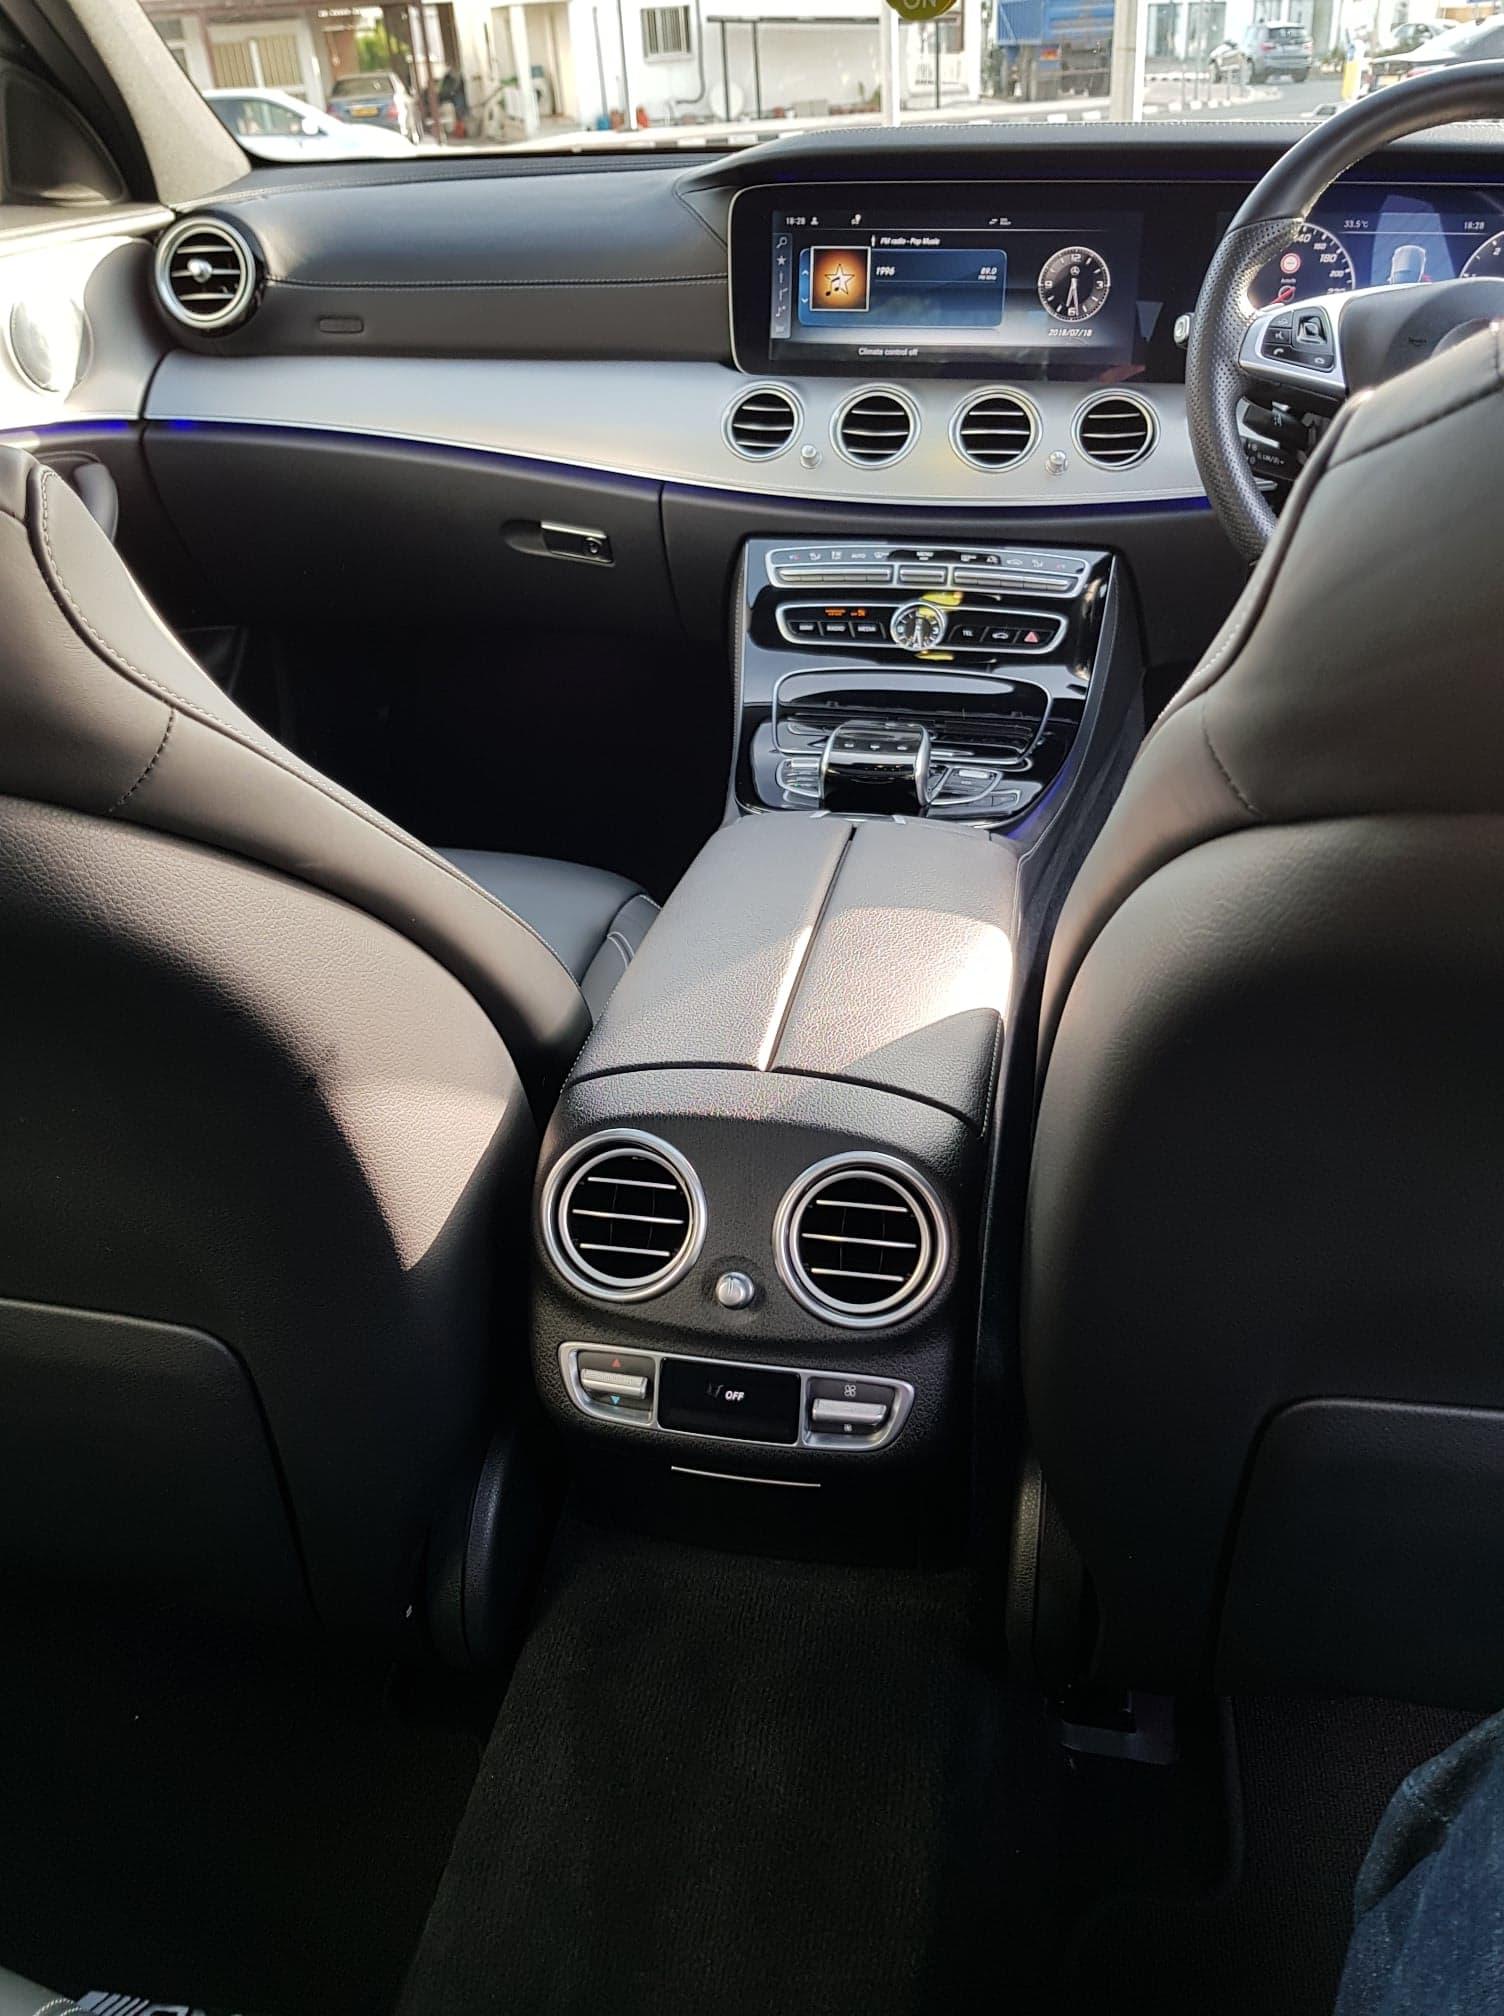 Mercedes Benz E-Class 220D Premium Plus AMG